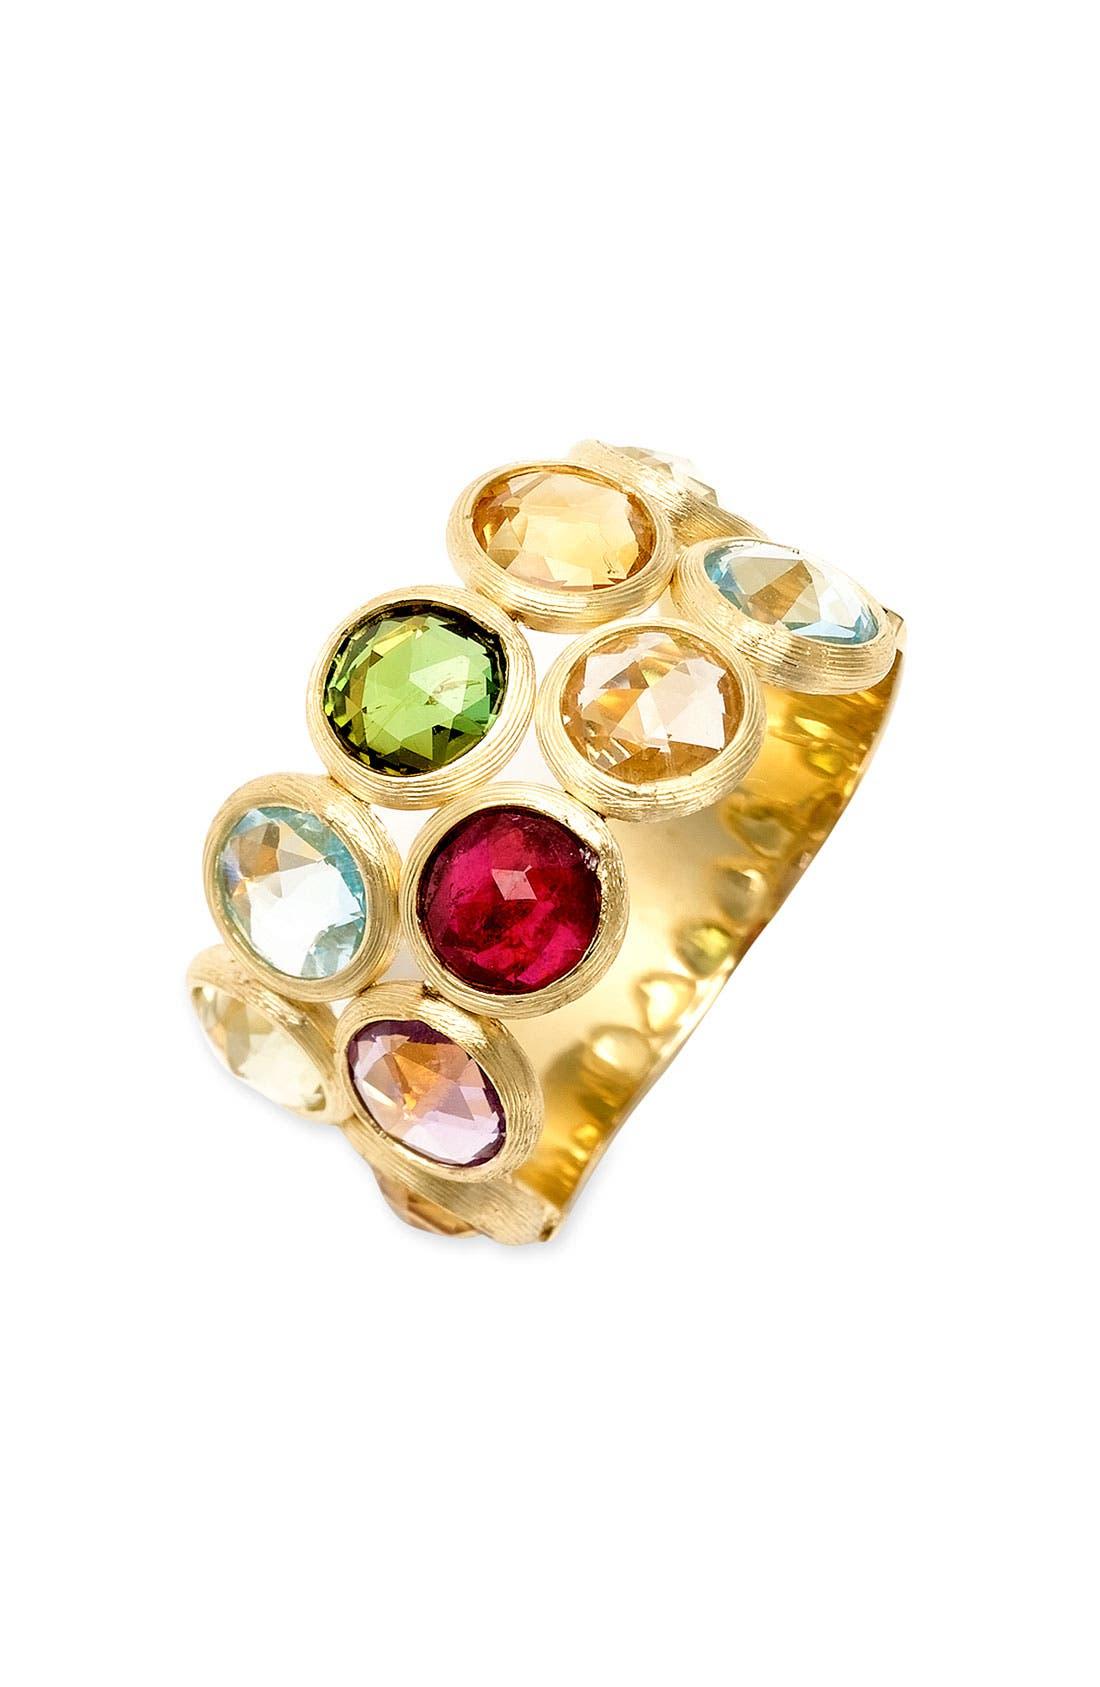 Main Image - Marco Bicego 'Mini Jaipur' Double Row Semiprecious Stone Ring